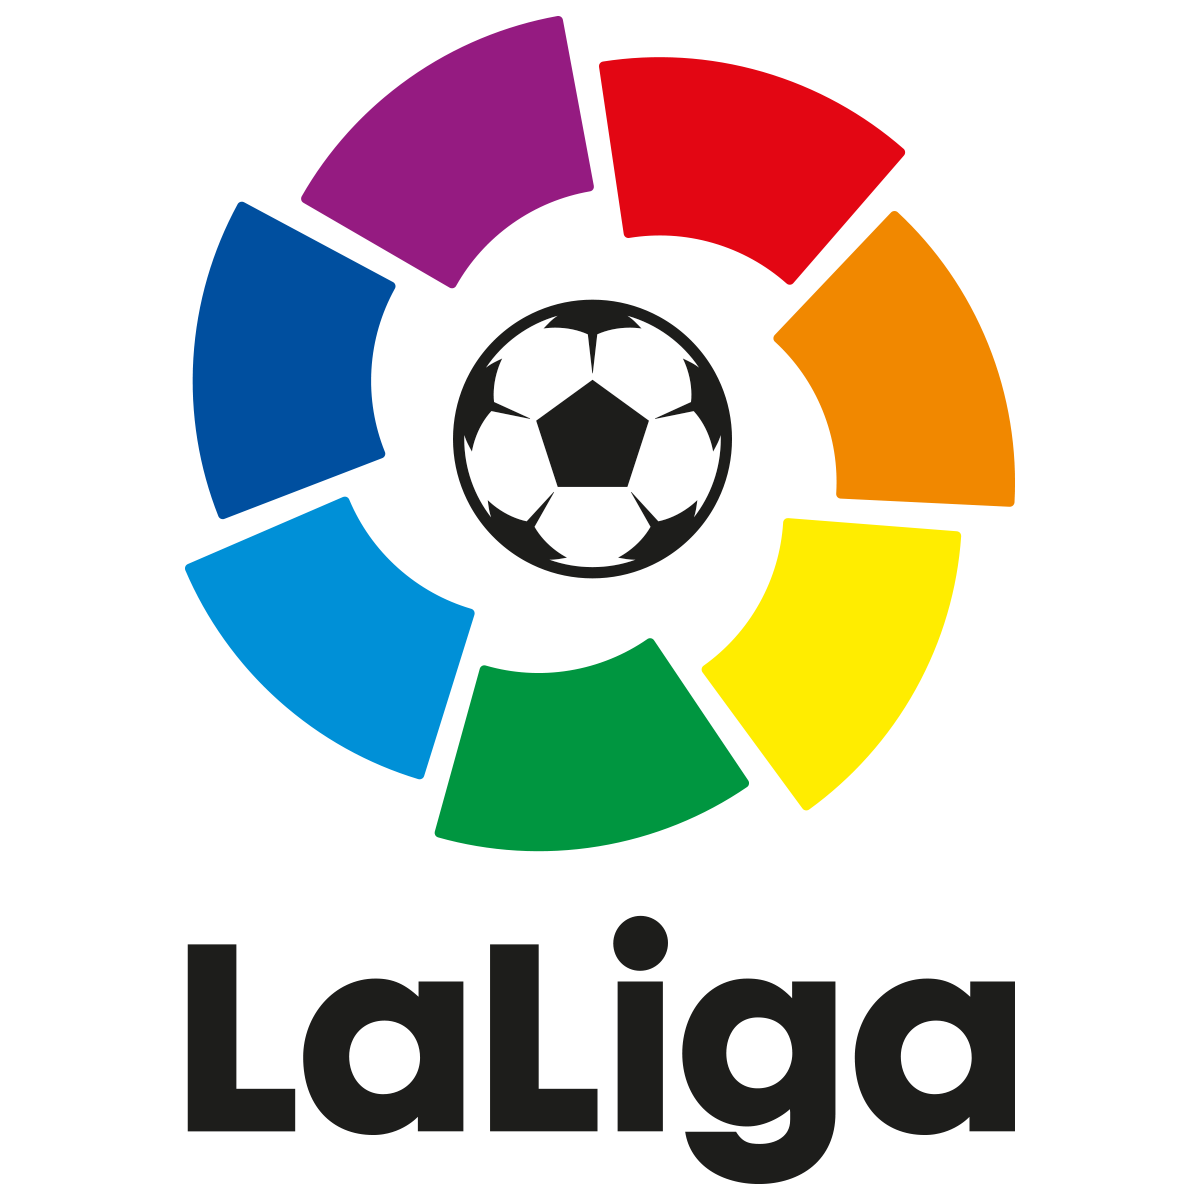 「Liga Española ロゴ」の画像検索結果